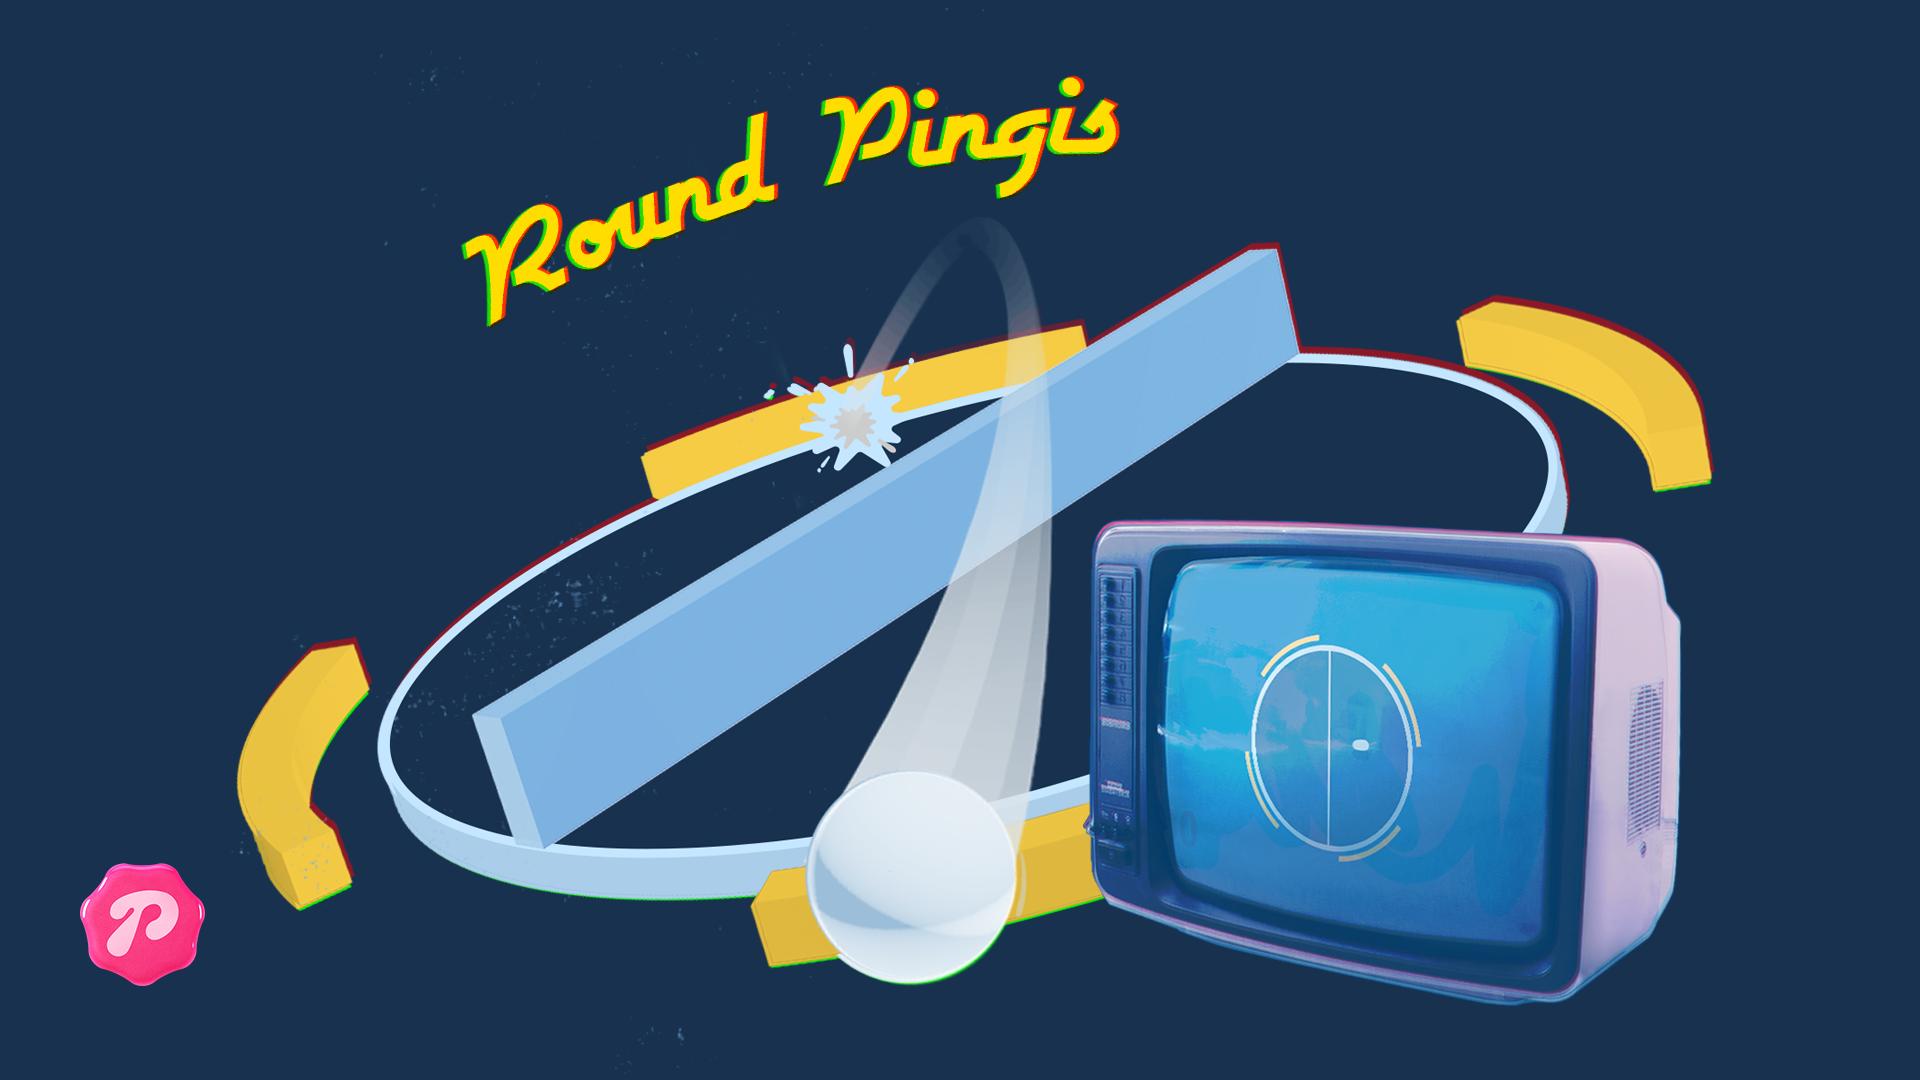 RoundPingis